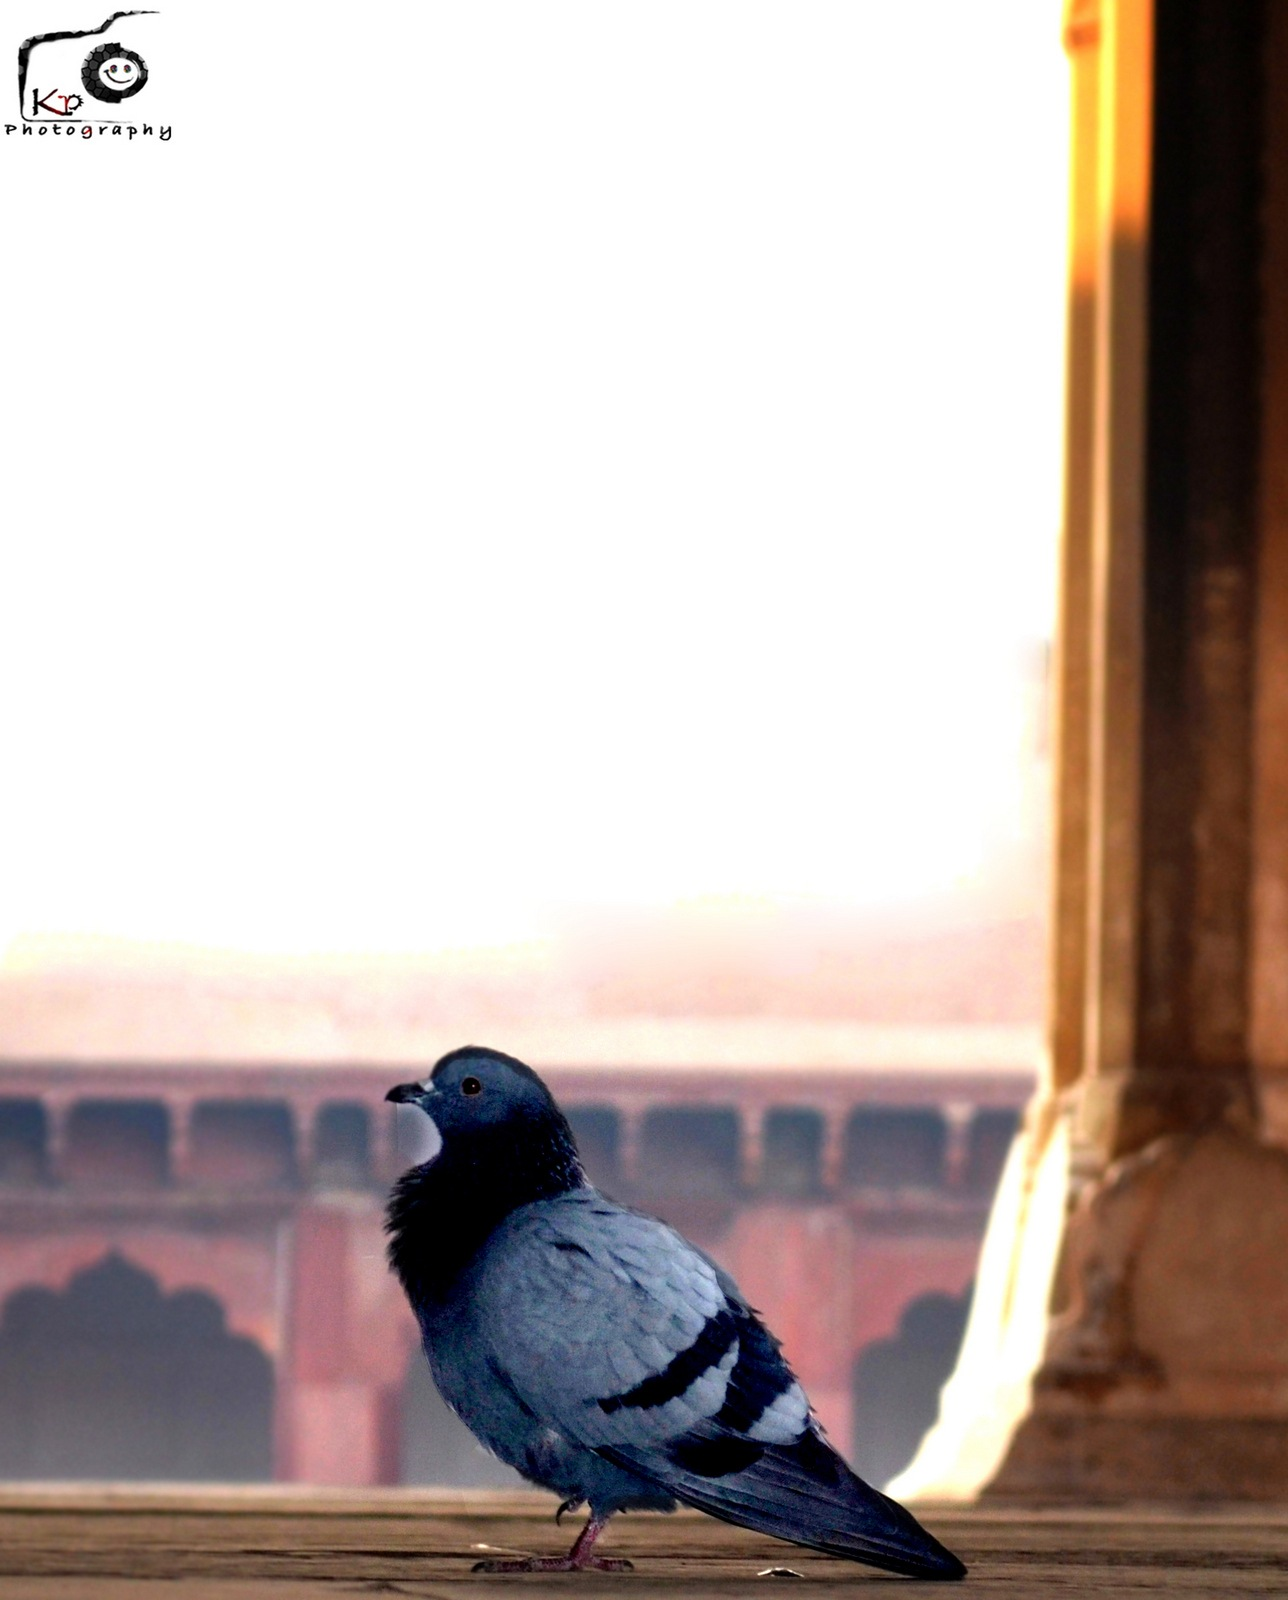 Untitled by Kshitij Patle